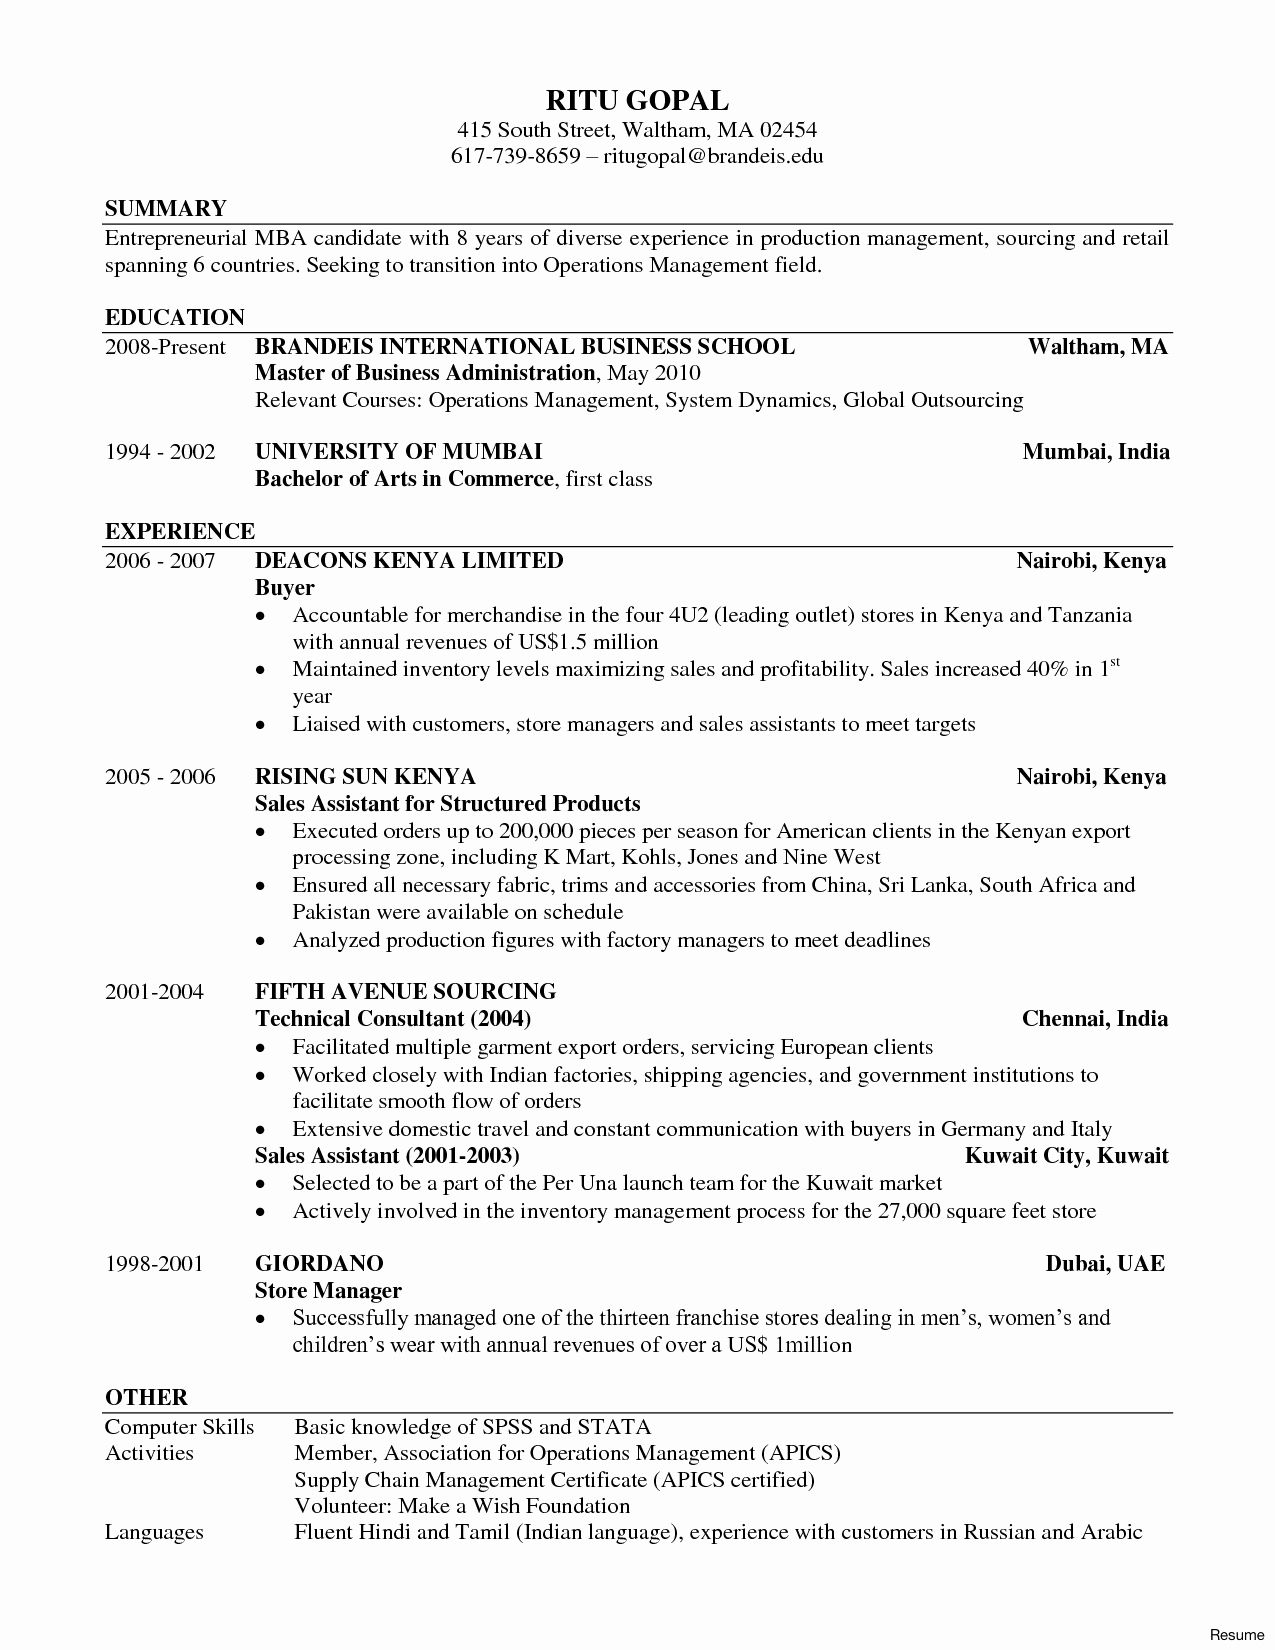 Cv Template Harvard Resume Format In 2020 Business Resume Template Business Resume Business Letter Sample